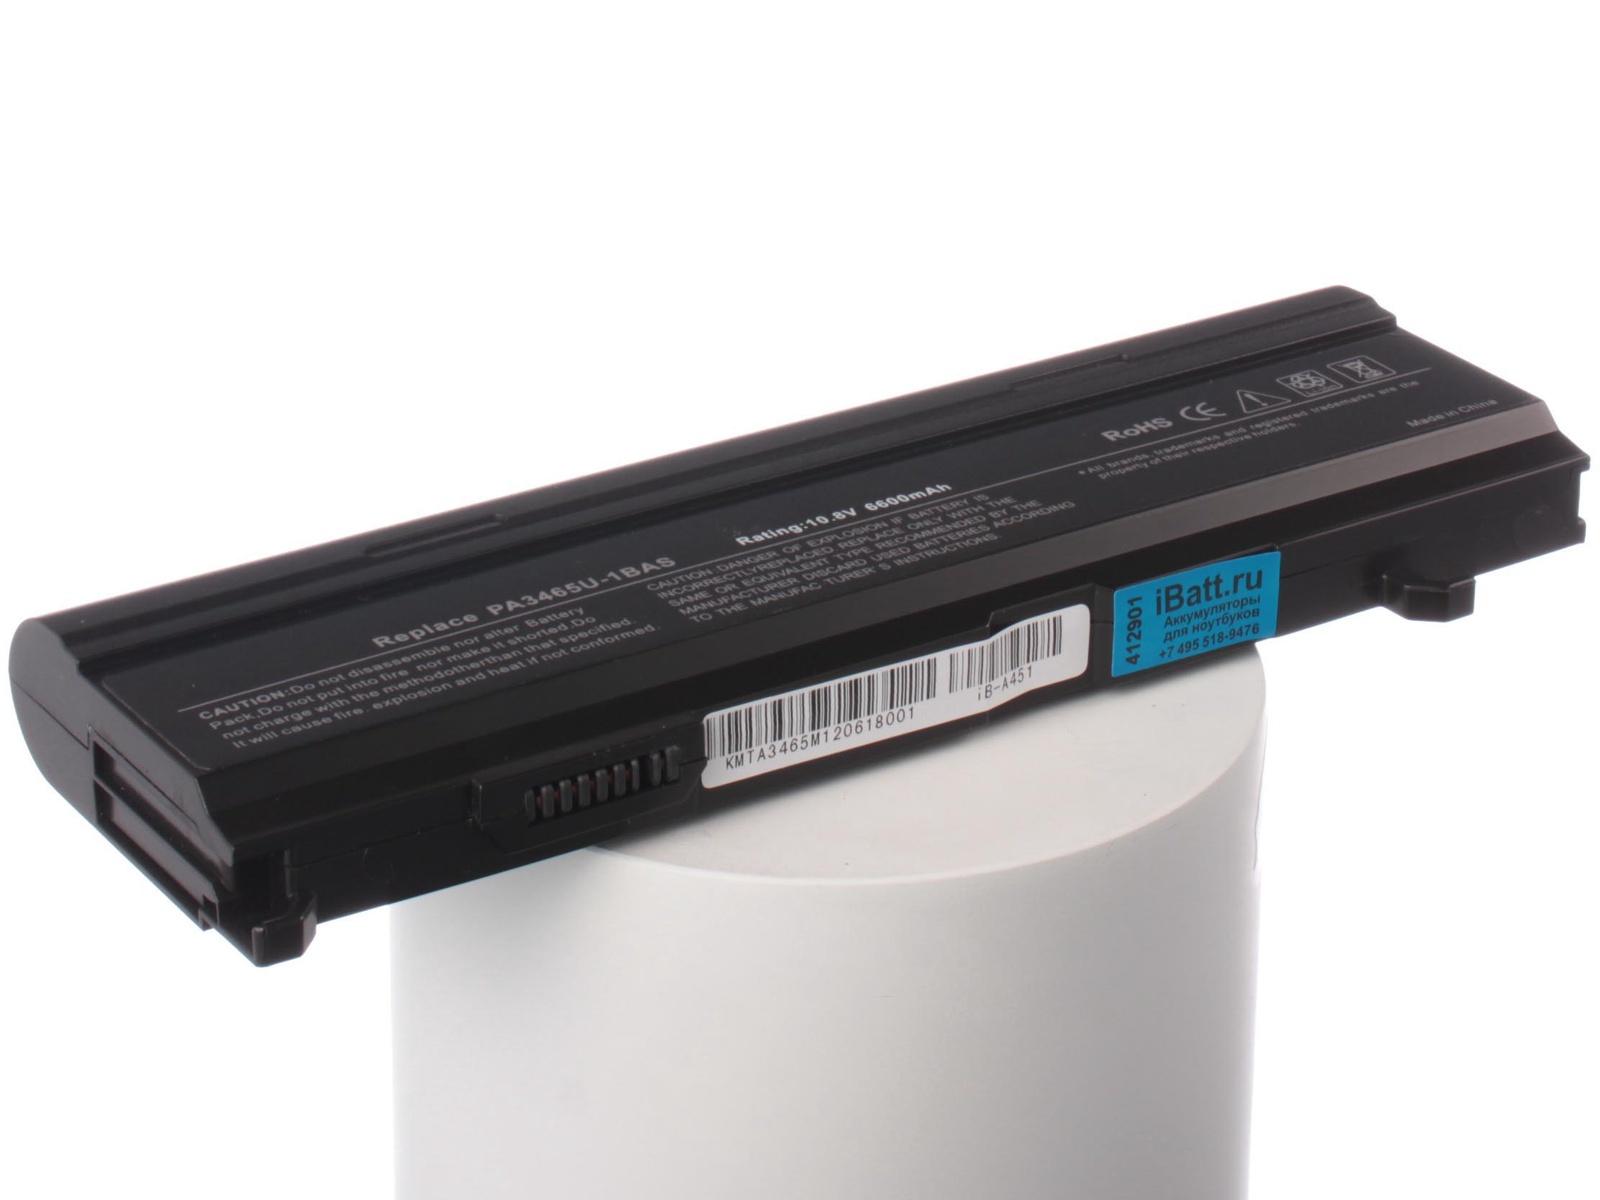 Аккумулятор для ноутбука iBatt для ToshiBa Satellite A105-S1712, Satellite M70-356, Satellite A135-S2266, Satellite A135-S4677, Satellite A100-500, Satellite A105-S2031, Satellite A135-S2246, Satellite A135-S2276 аккумулятор 4parts lpb m70 для asus f70 g71 g72 m70 n70 n90 pro70 x71 x72 series 11 1v 4400mah